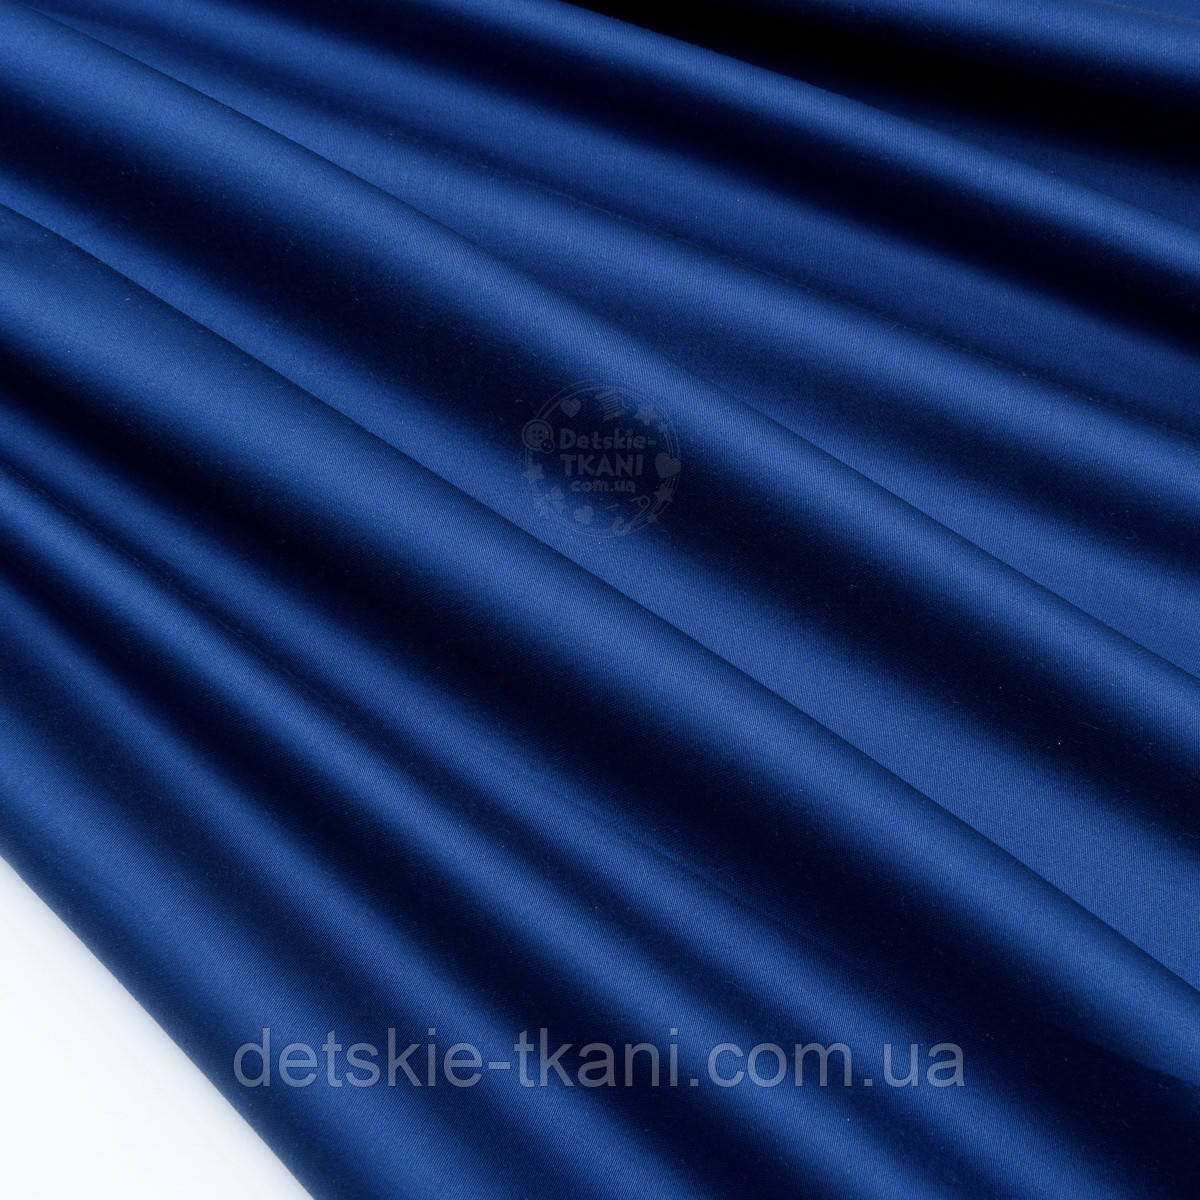 Лоскут сатина цвет тёмно-синий №1749с, размер 44*120 см